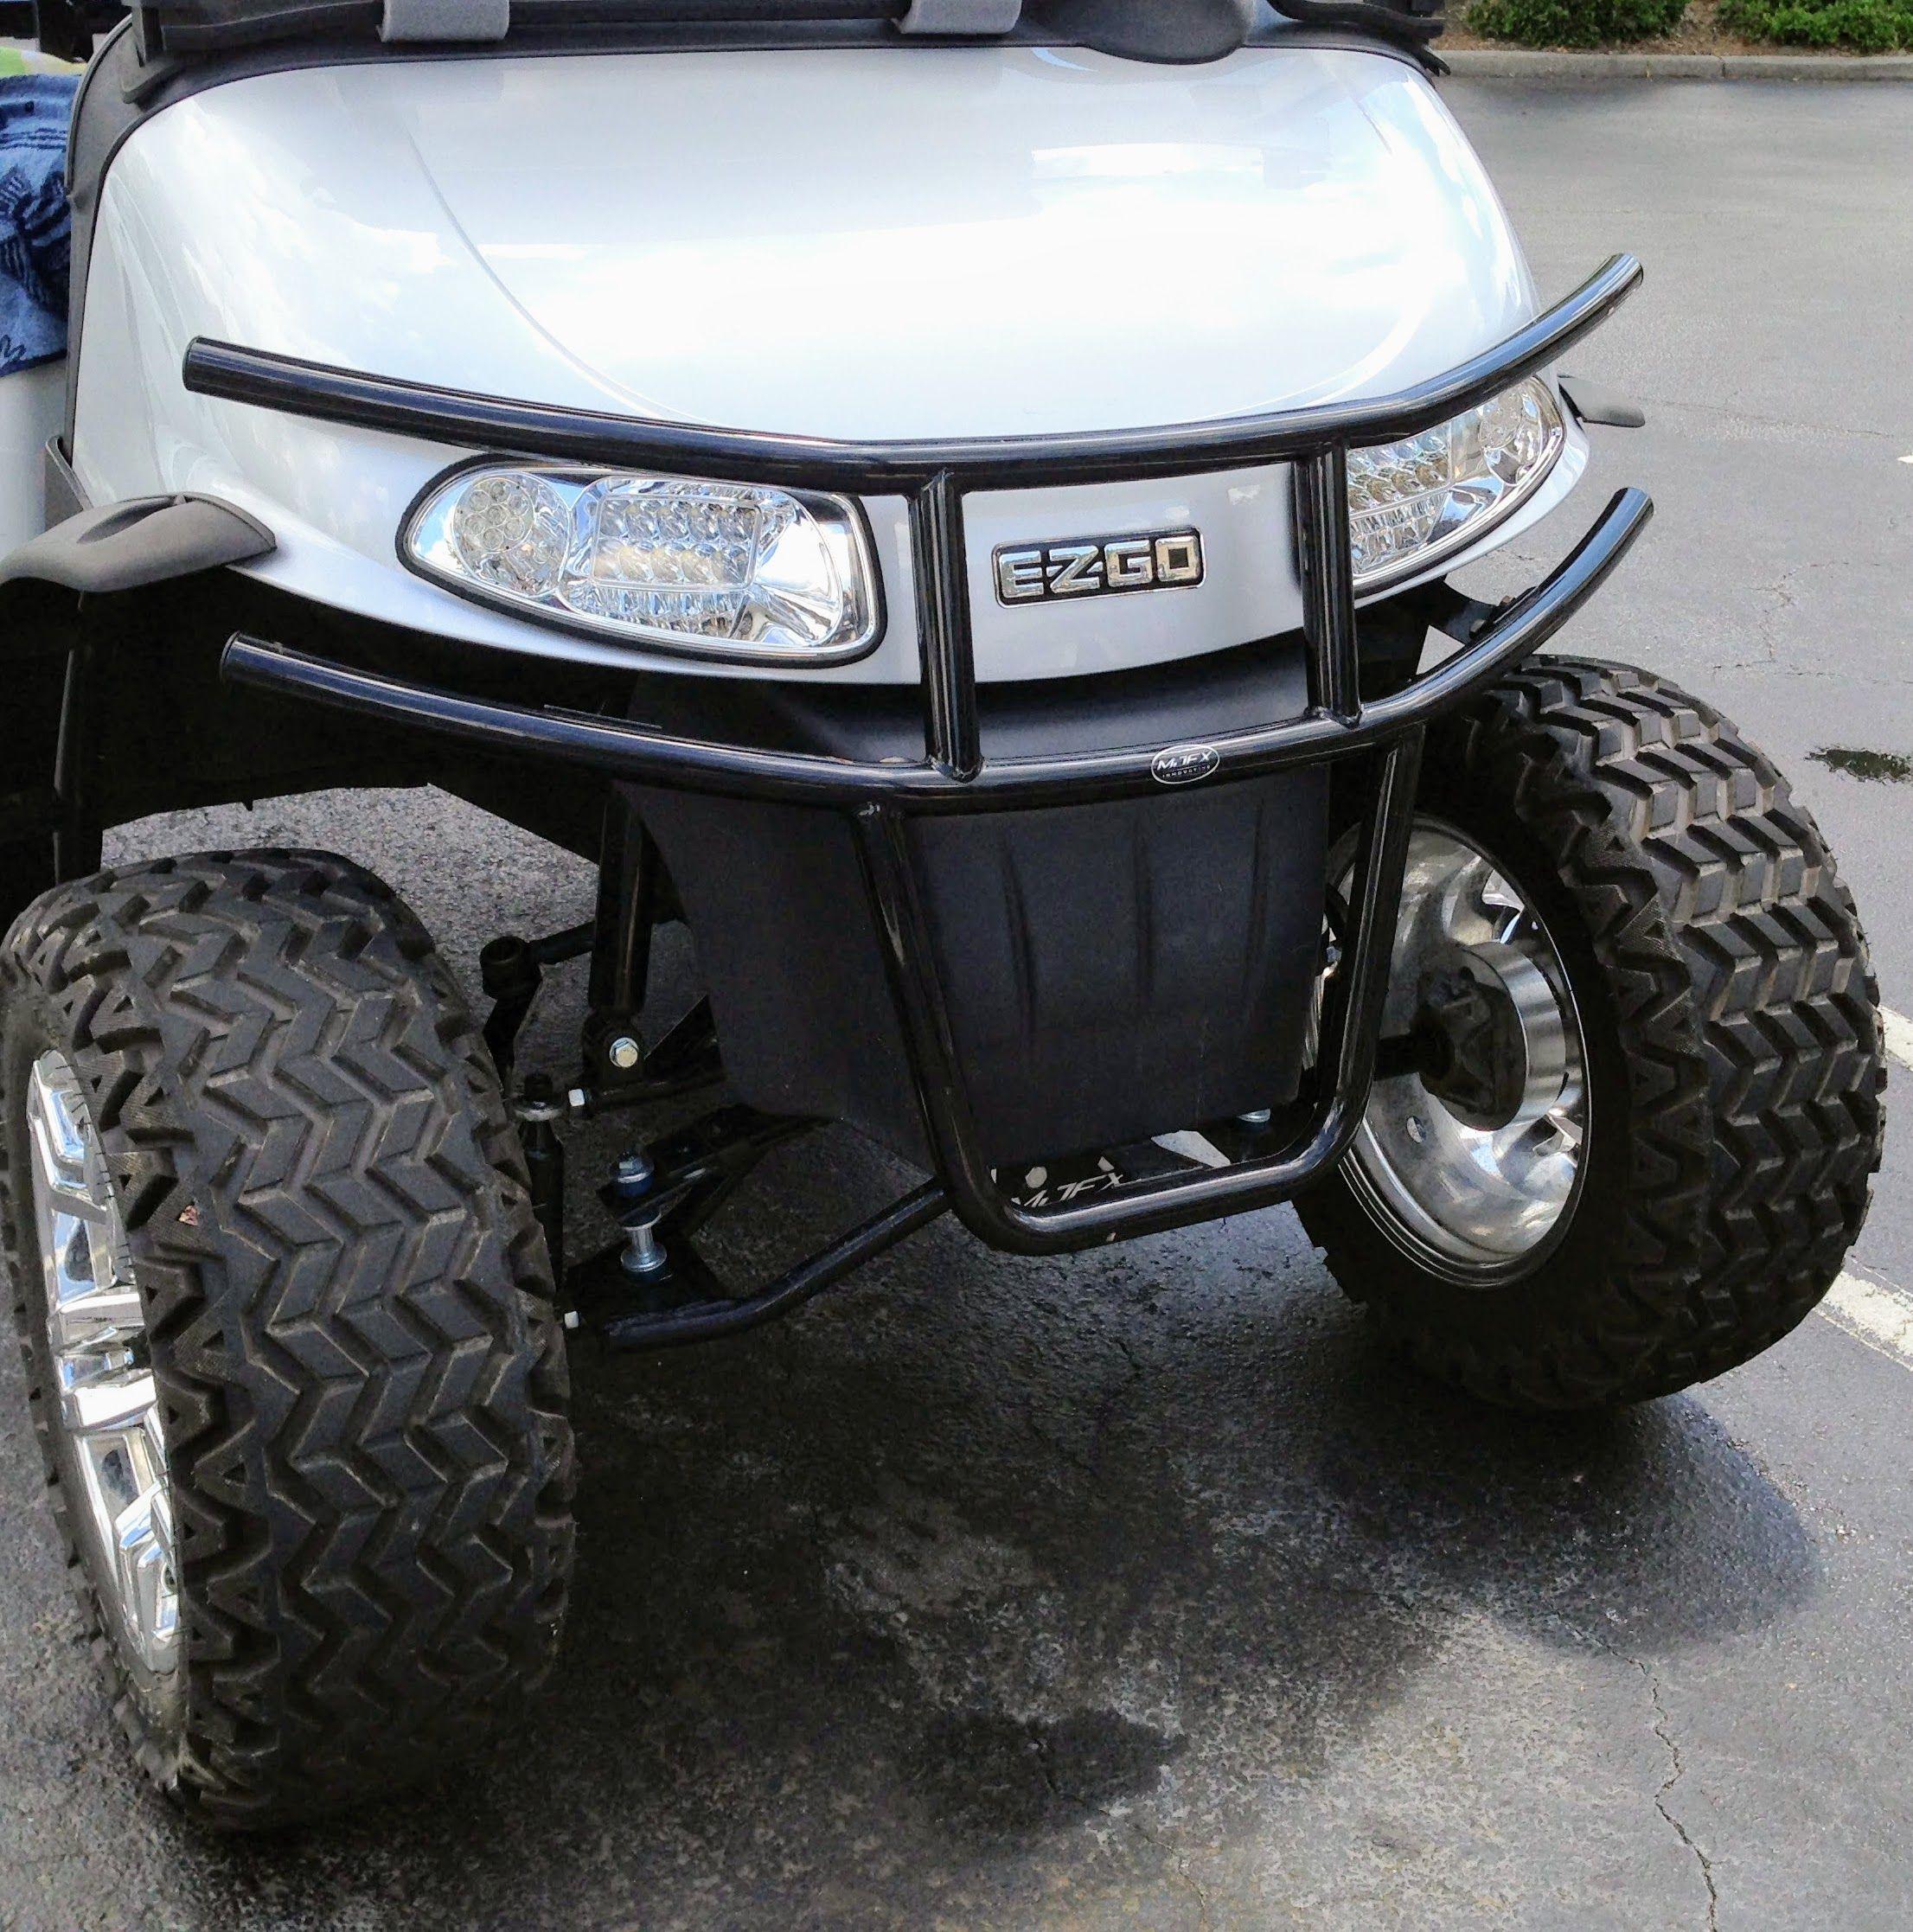 EZgo golf cart brush guards add a custom look.